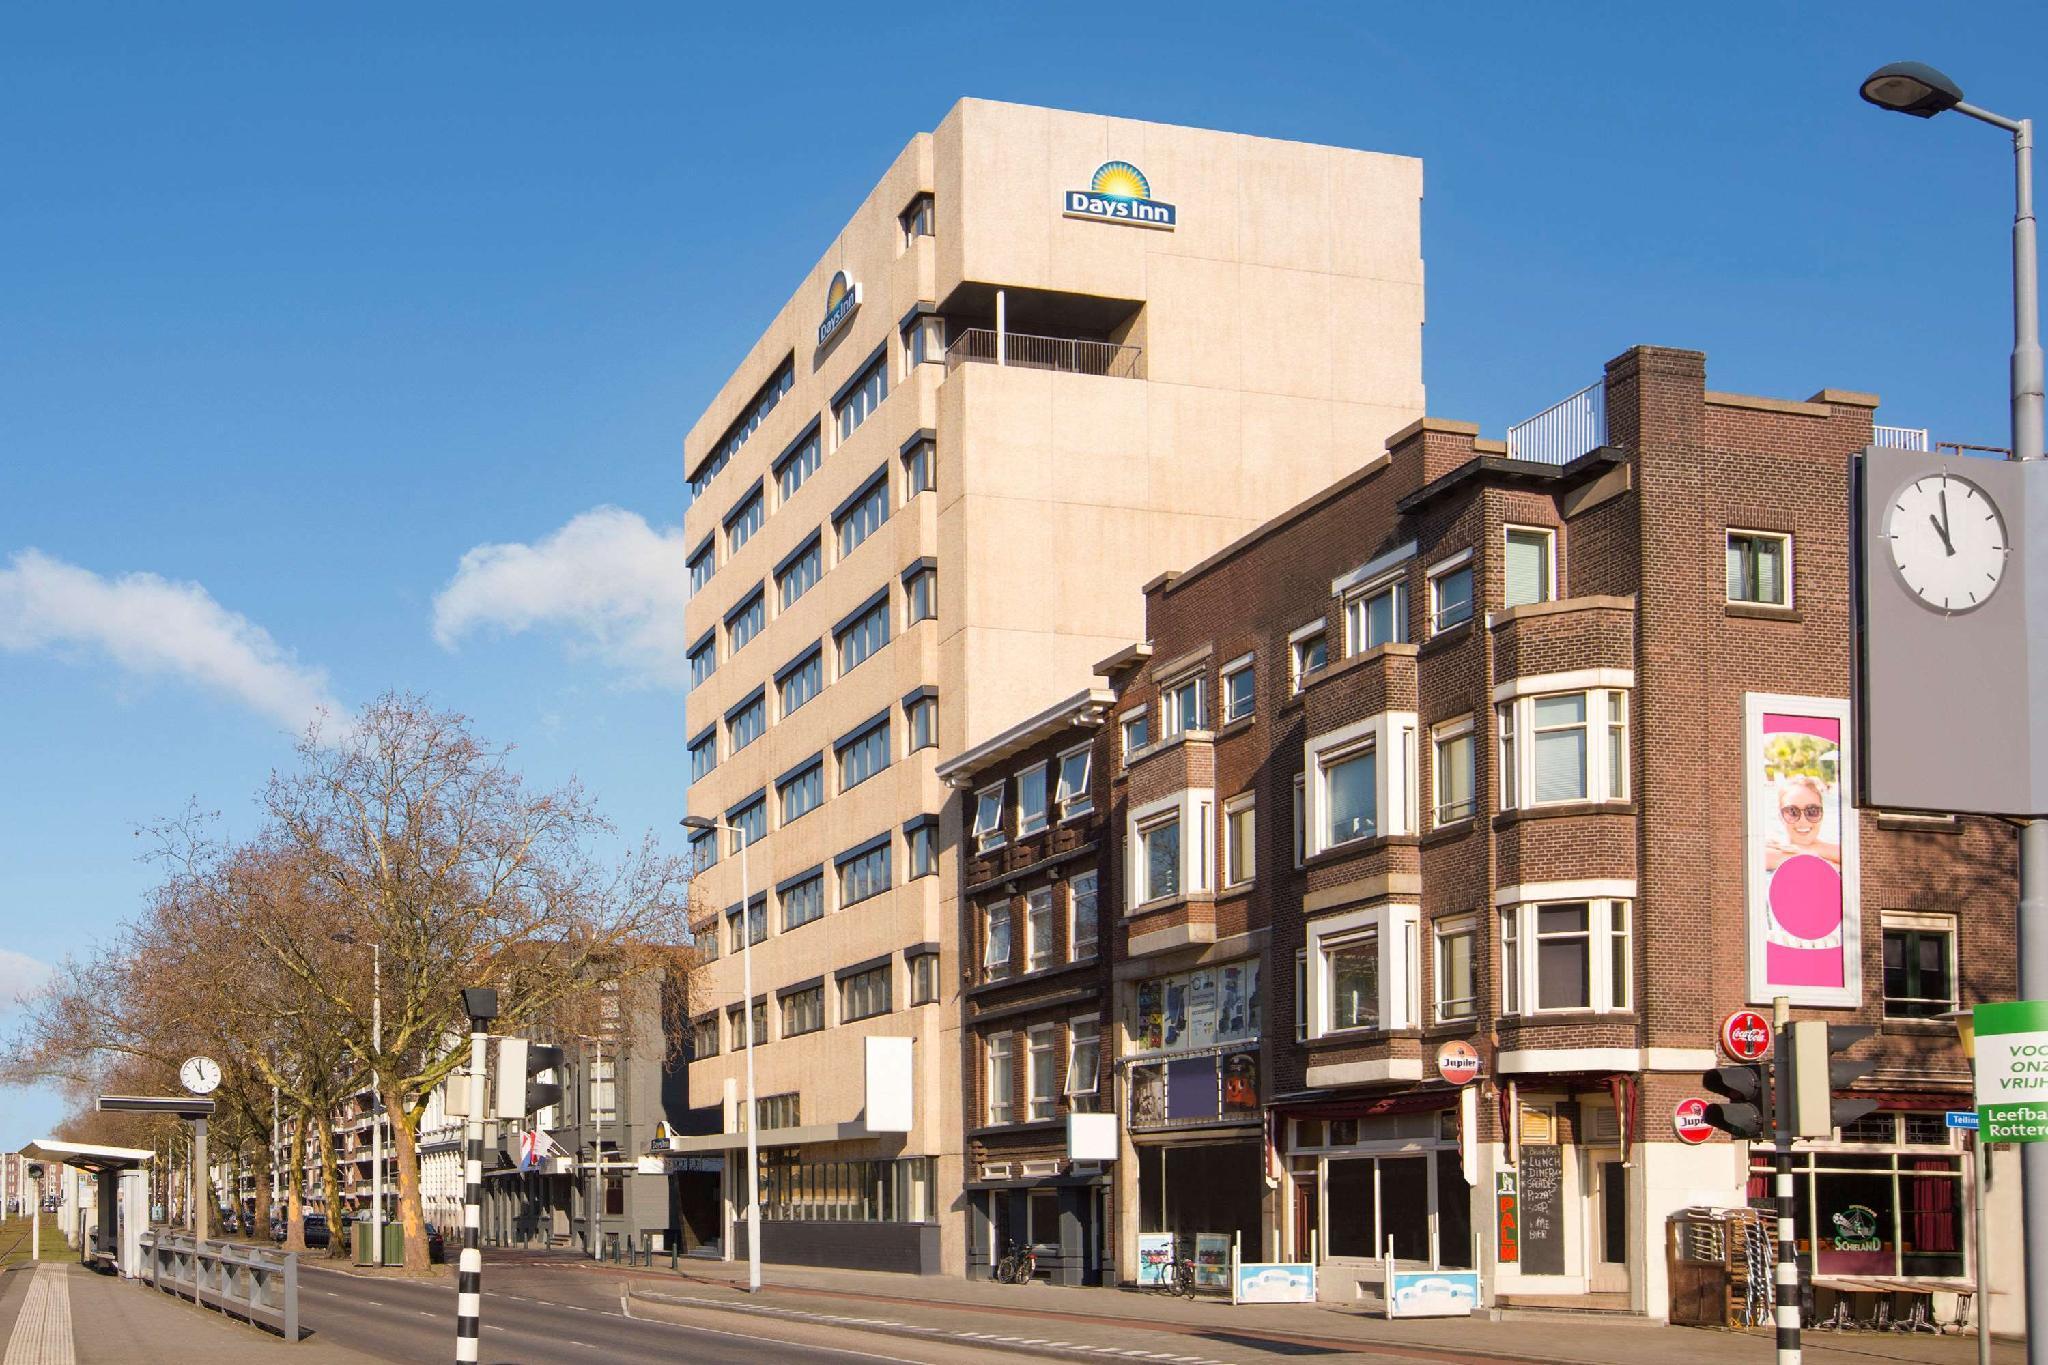 Days Inn by Wyndham Rotterdam City Centre,Zuid-Holland